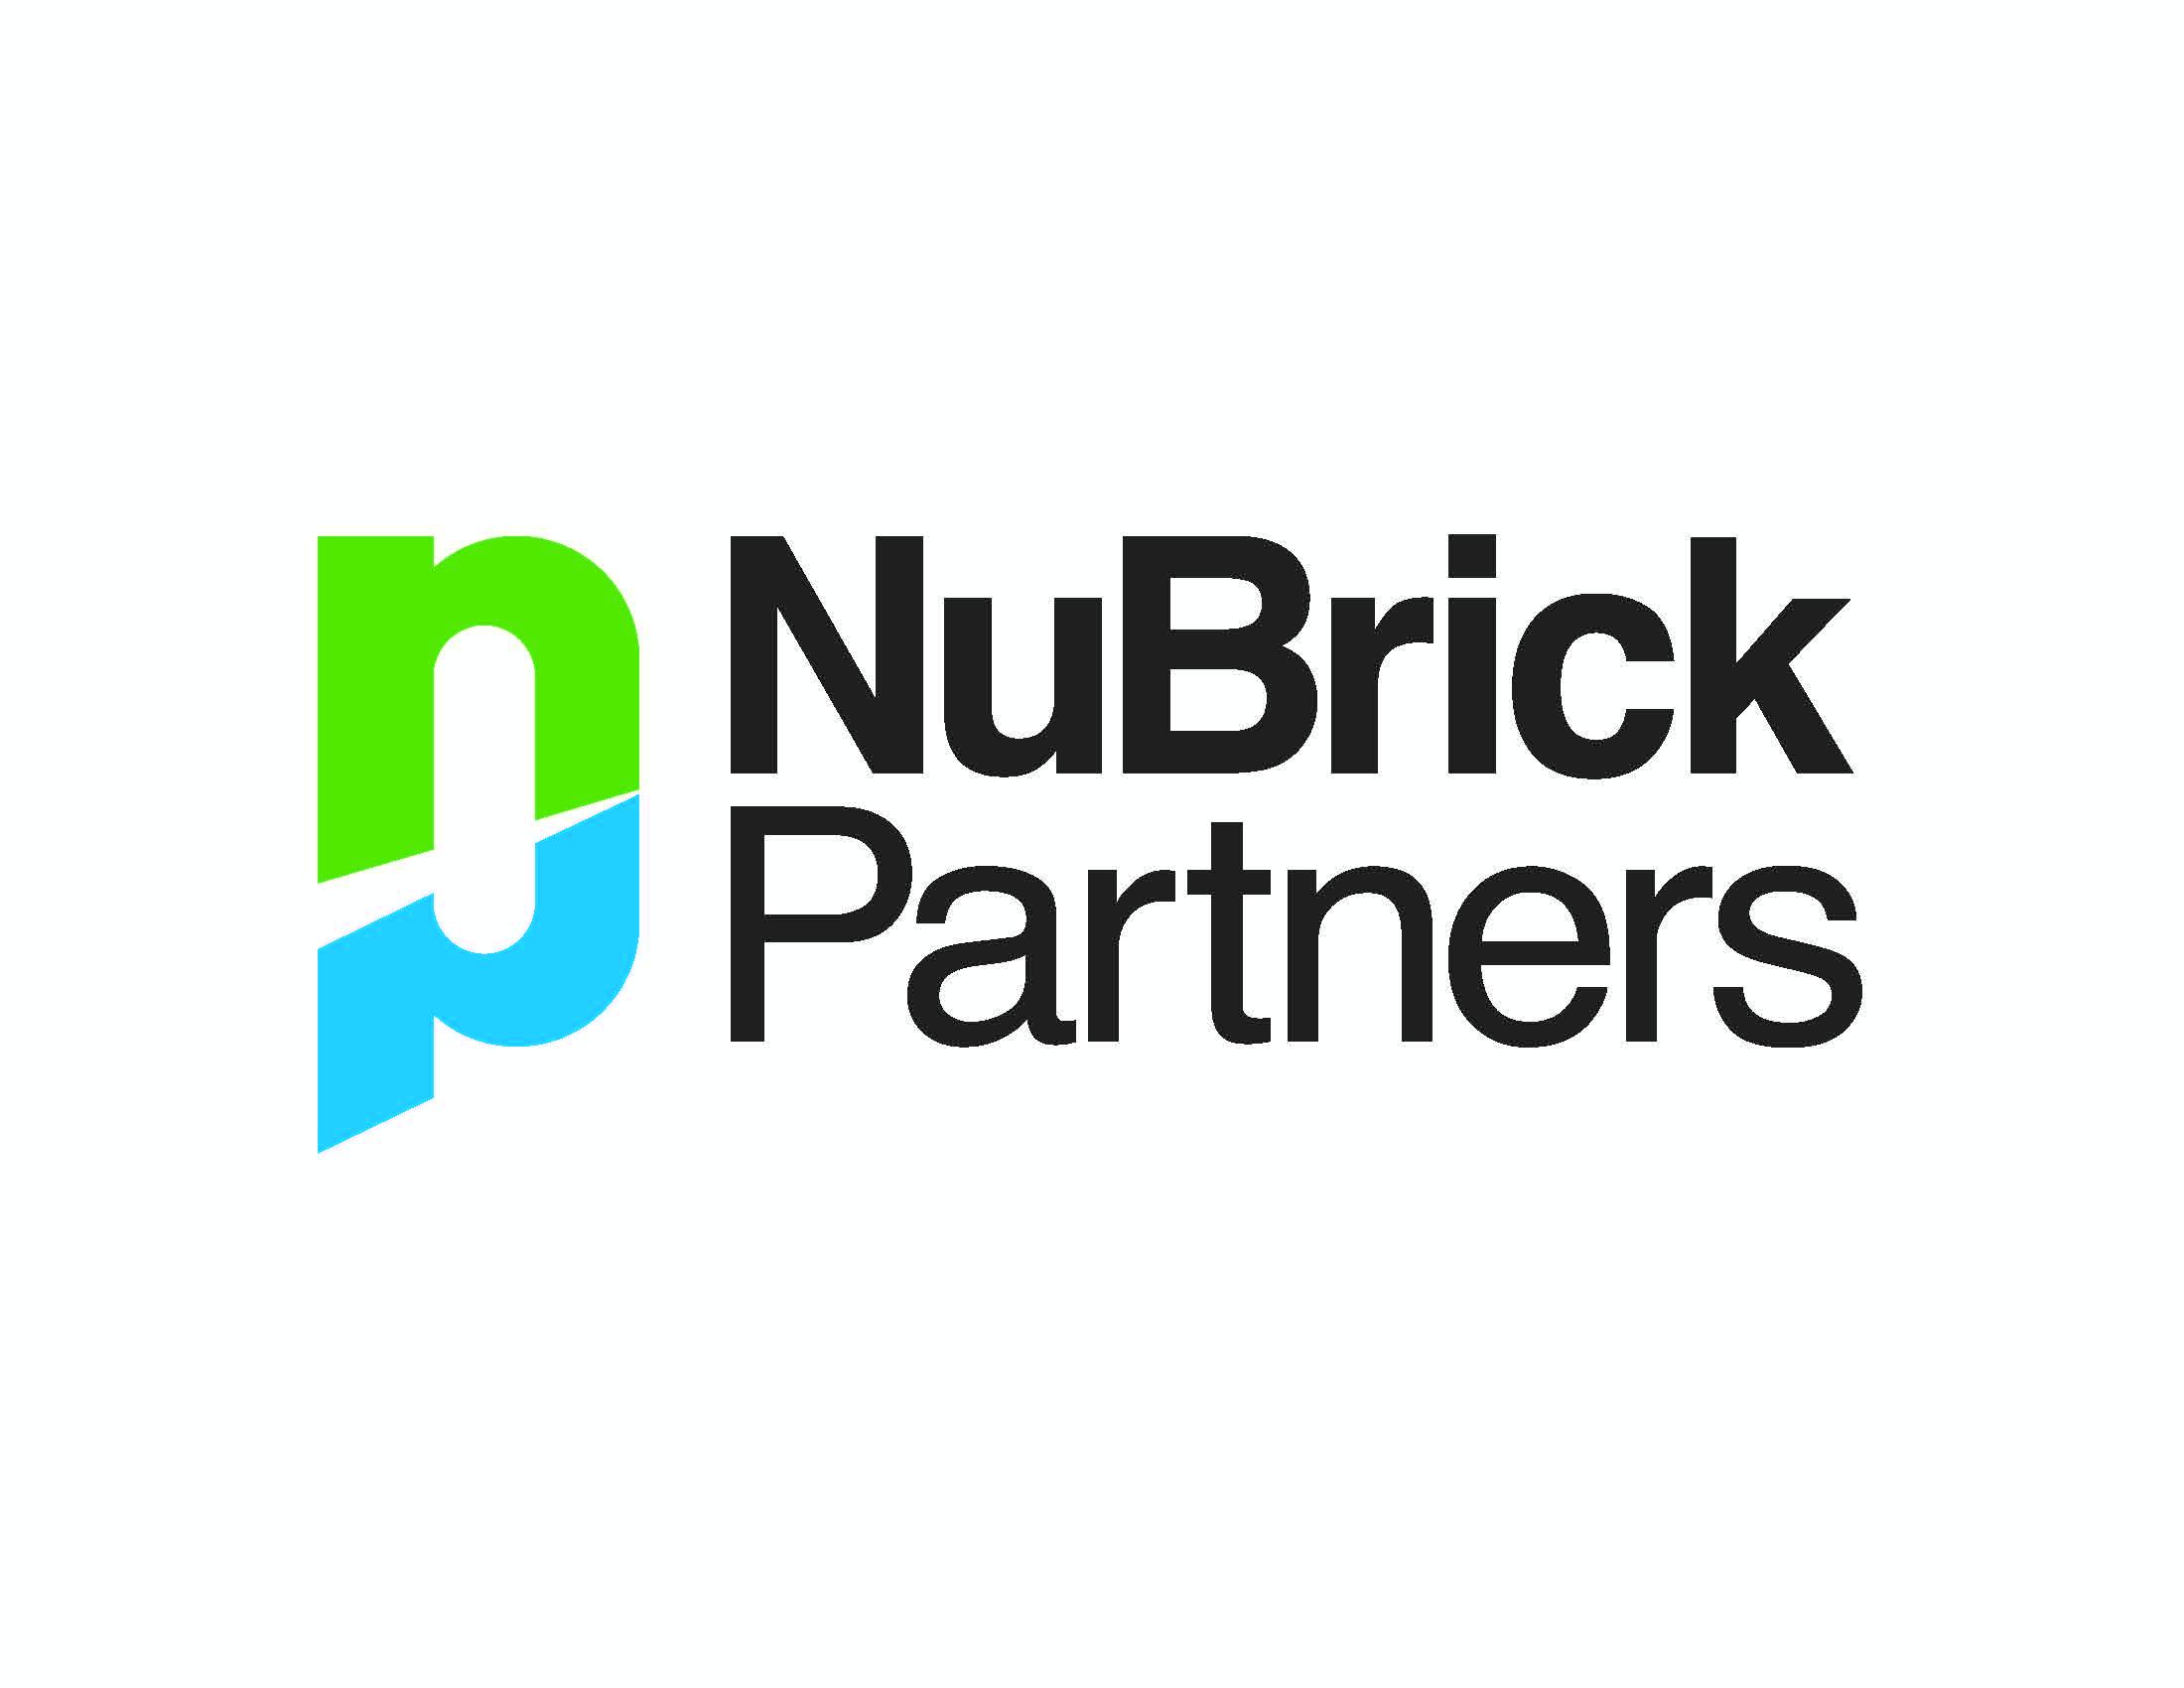 NuBrick-Partners--1585417504.jpg